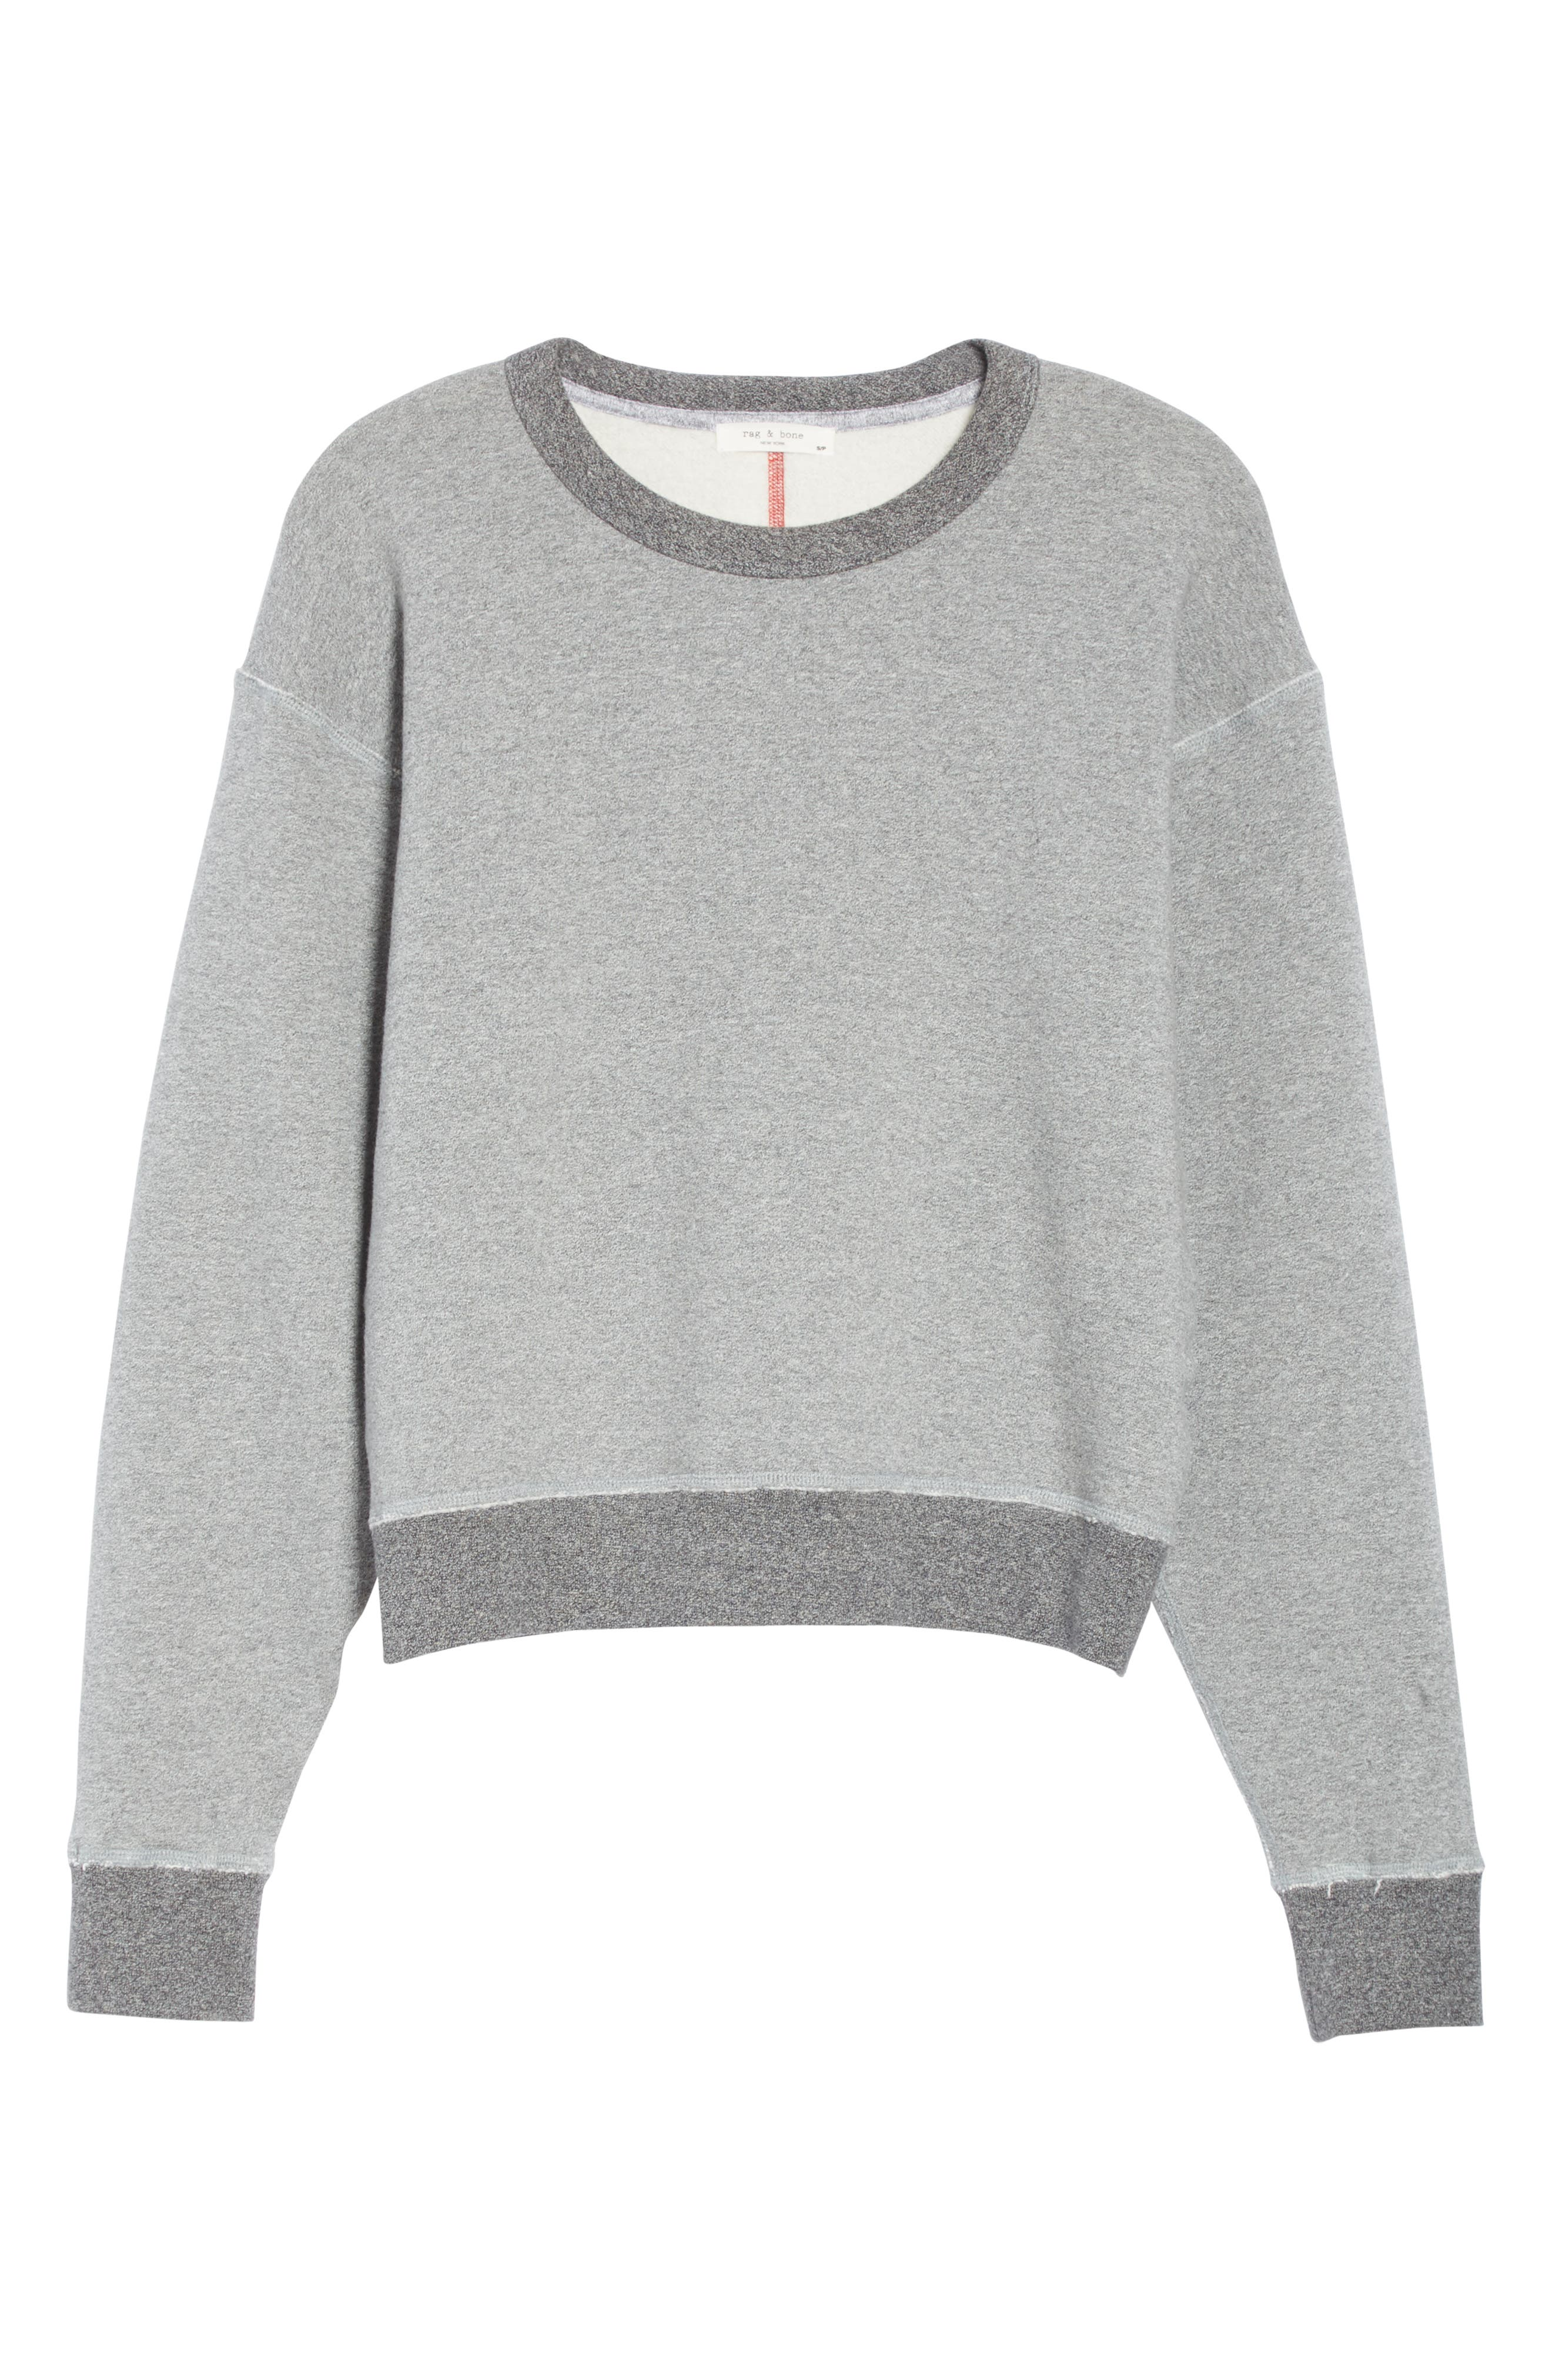 rag & bone Best Sweatshirt,                             Alternate thumbnail 6, color,                             HEATHER GREY